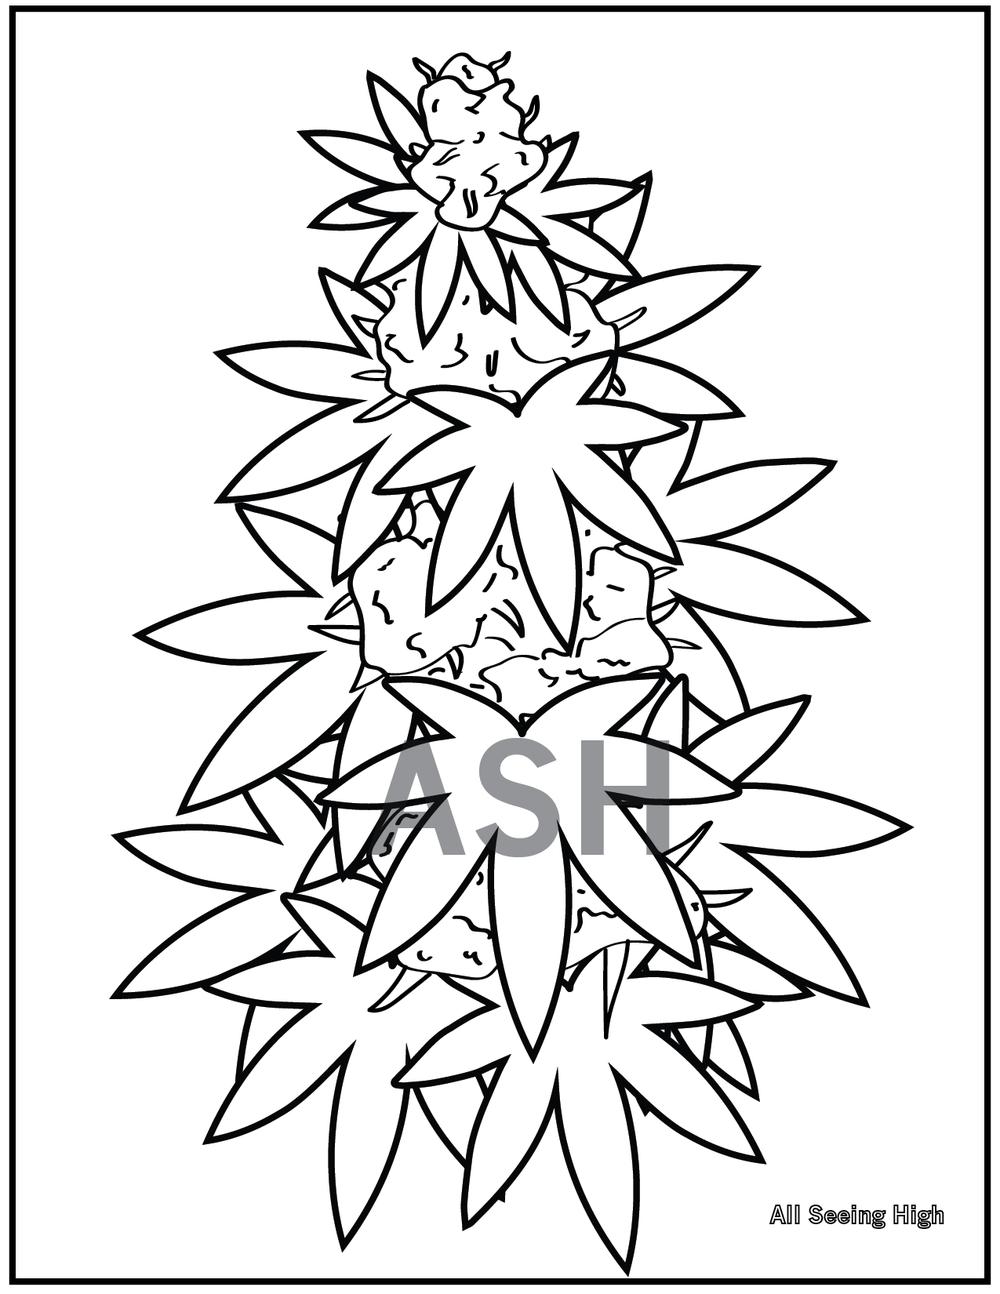 Marijuana Plant Colouring Page-02.png